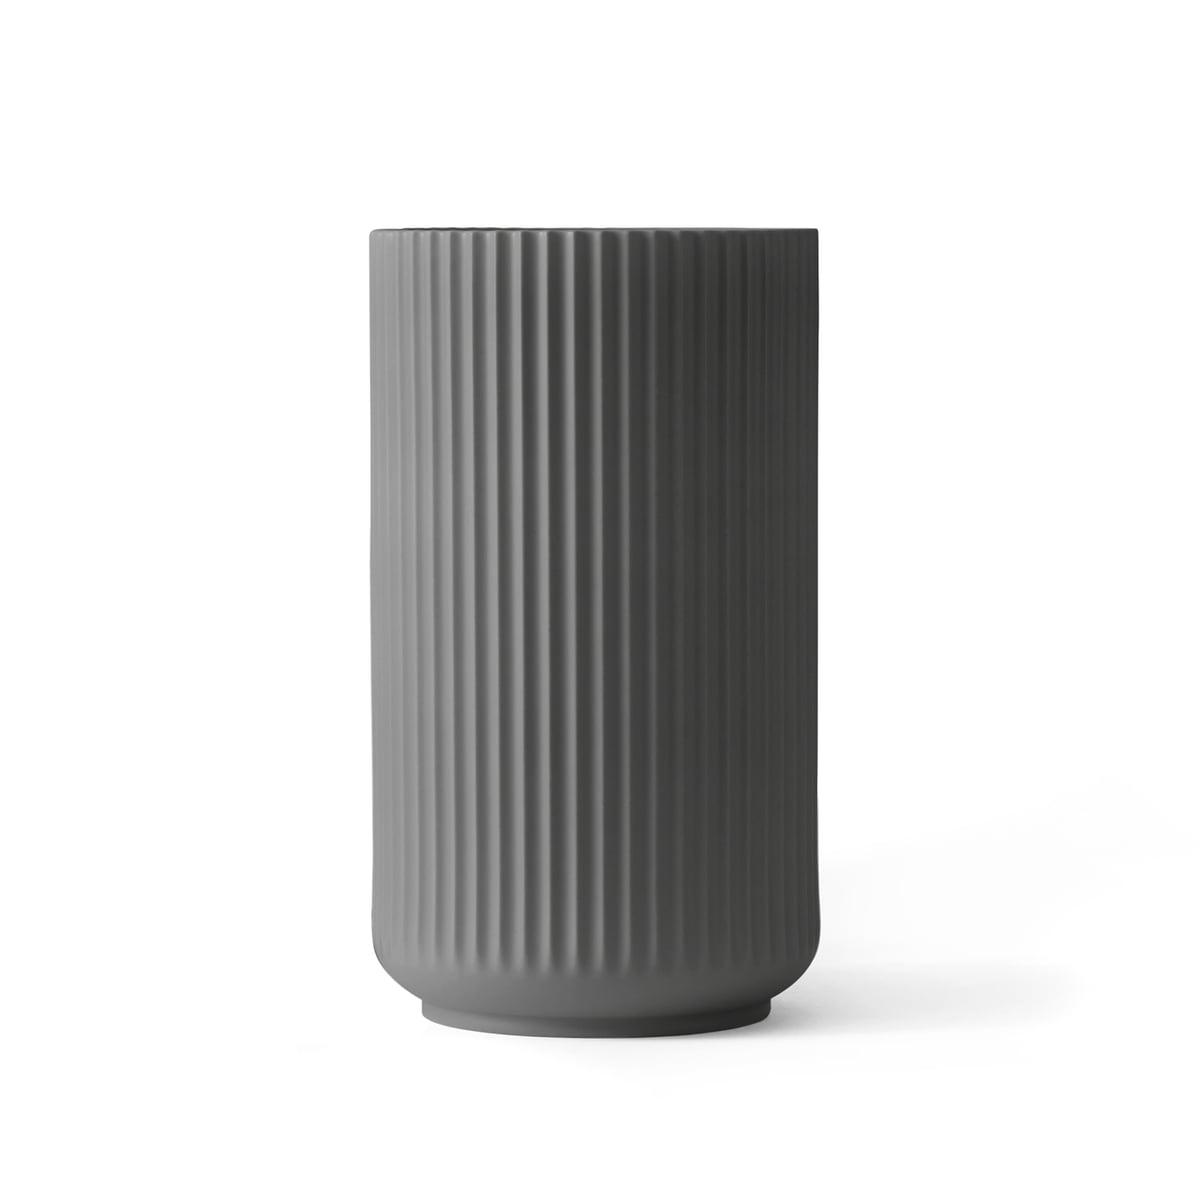 Splinterny Lyngby Vase dark grey in the shop online KJ41